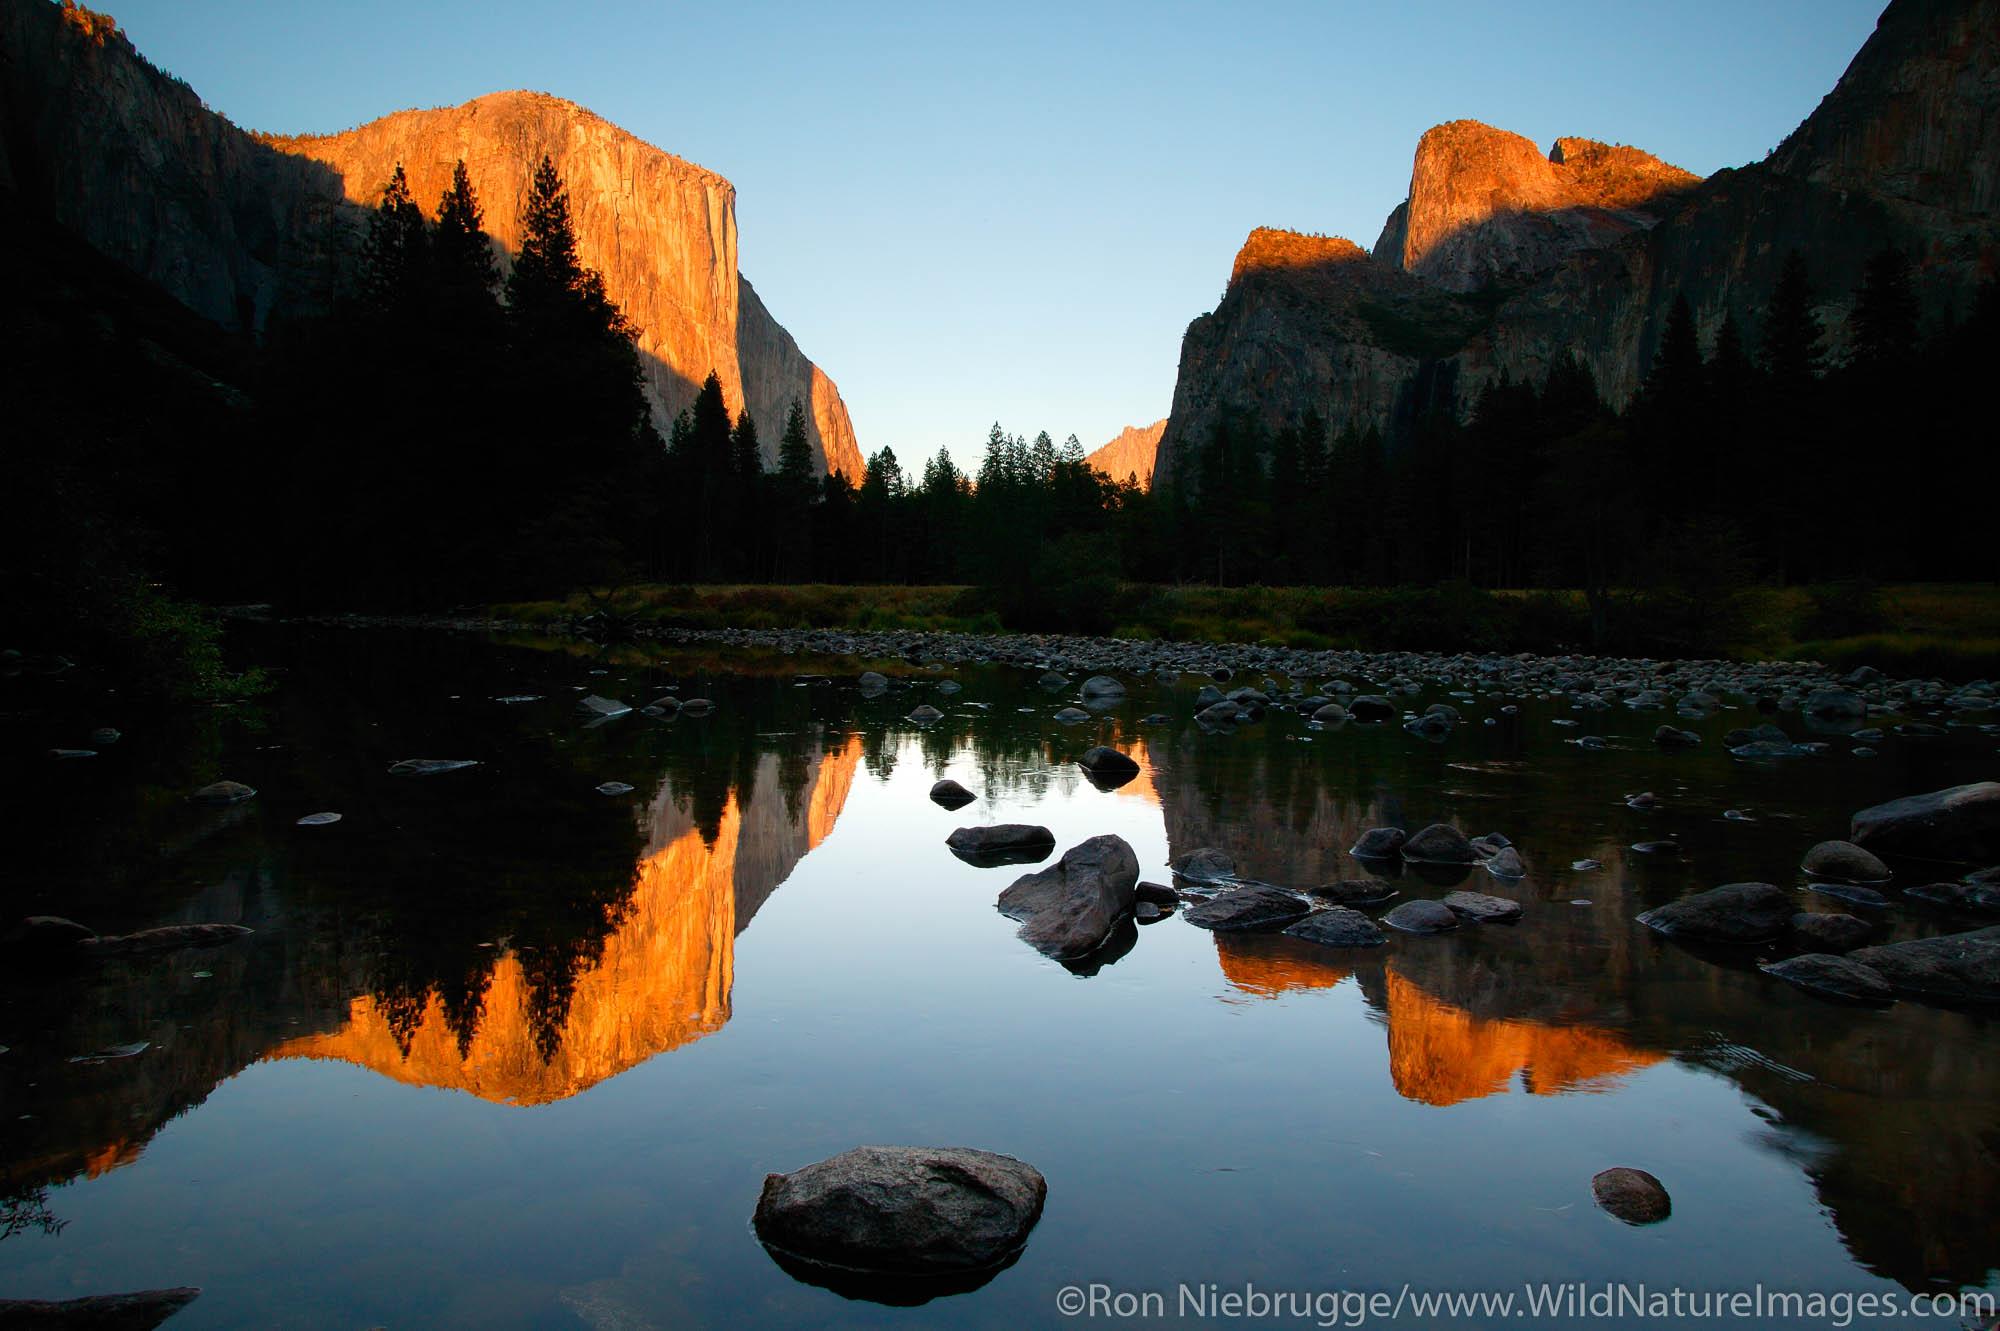 El Capitan and the Merced River, Yosemite National Park, California.